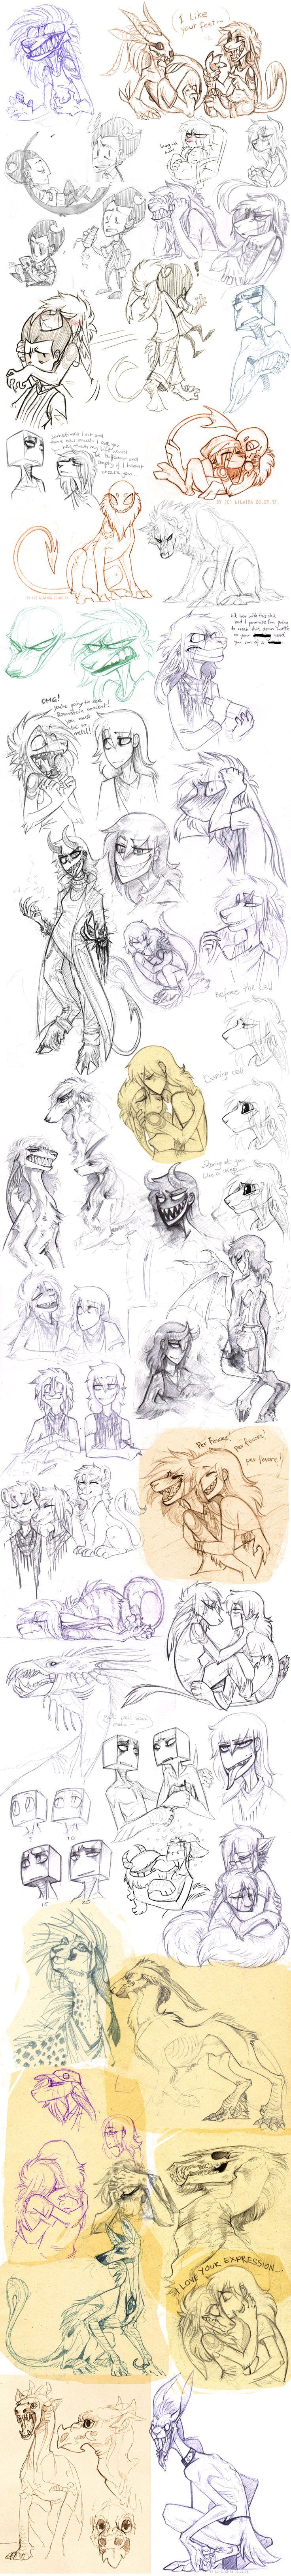 Sketch dump 48 by LiLaiRa on DeviantArt